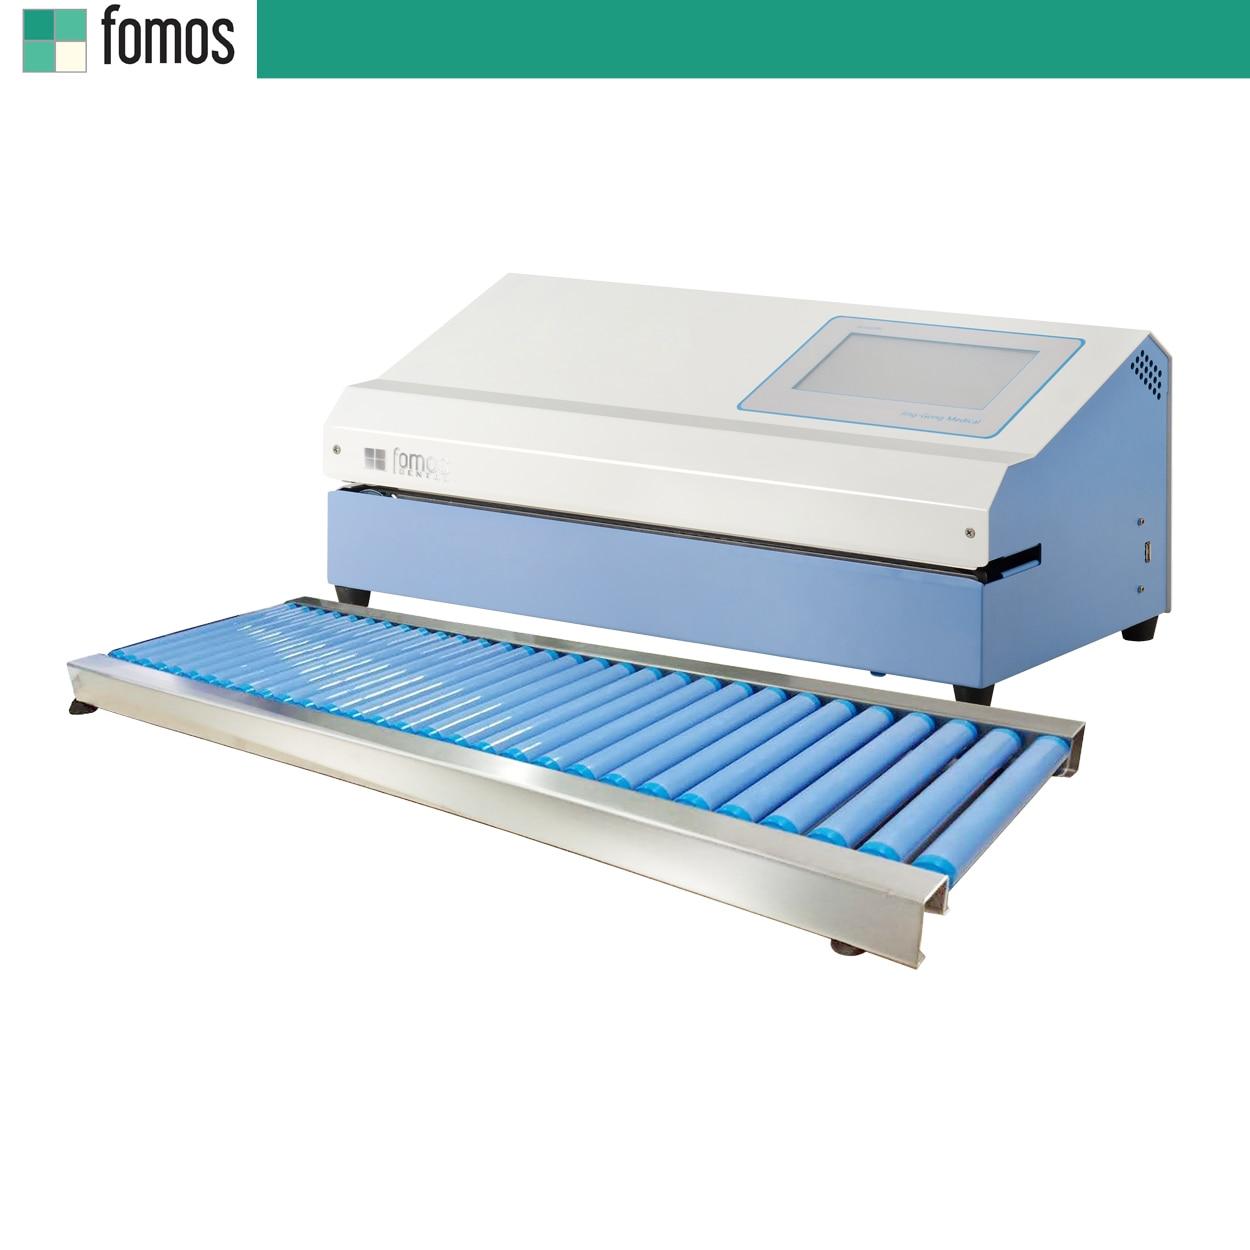 Fomos Automatic Sealing Machine - Automatic Roll Bag Sealing Device - Automatic Sterilization roll closing